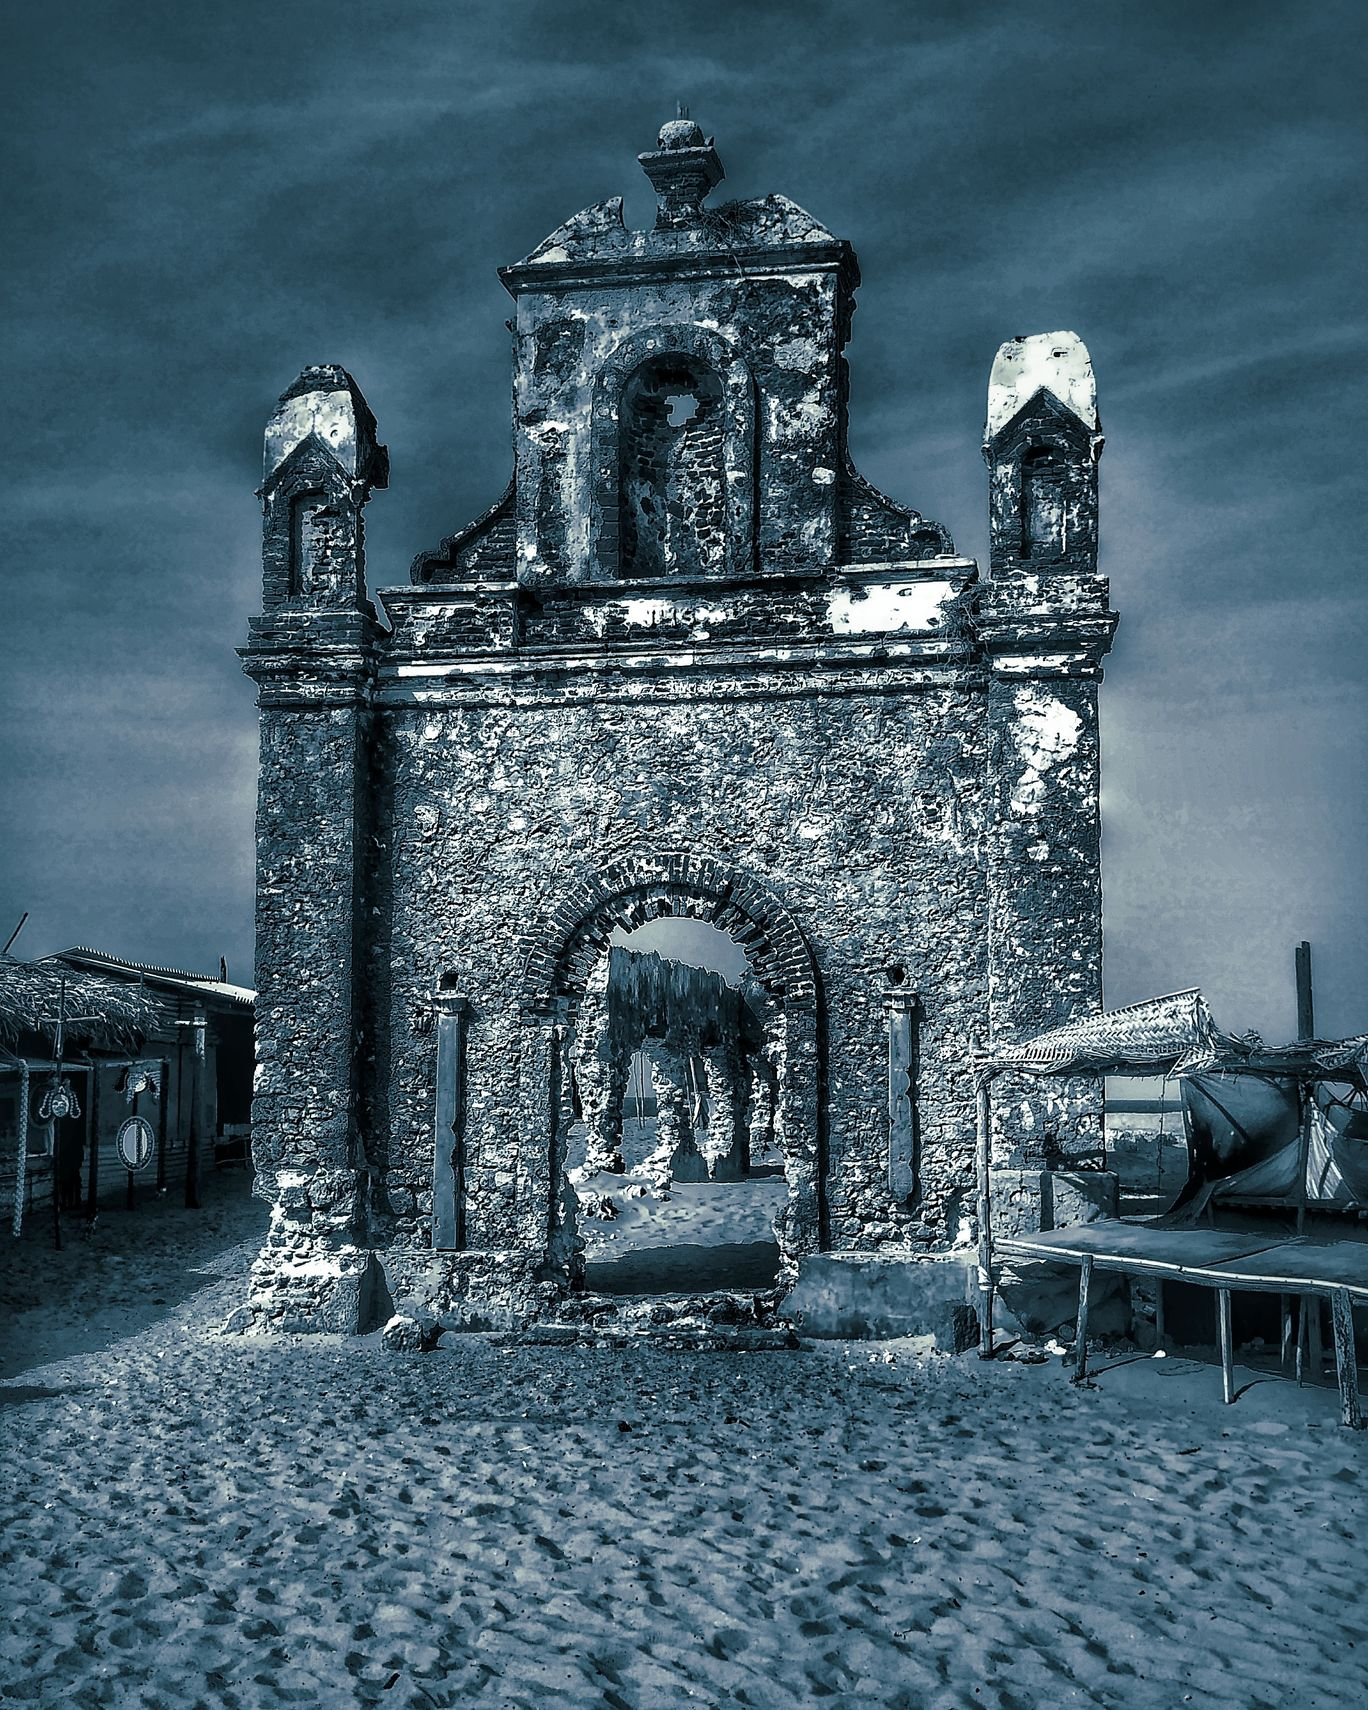 Photo of Dhanushkodi Old Church By suvojit purkait